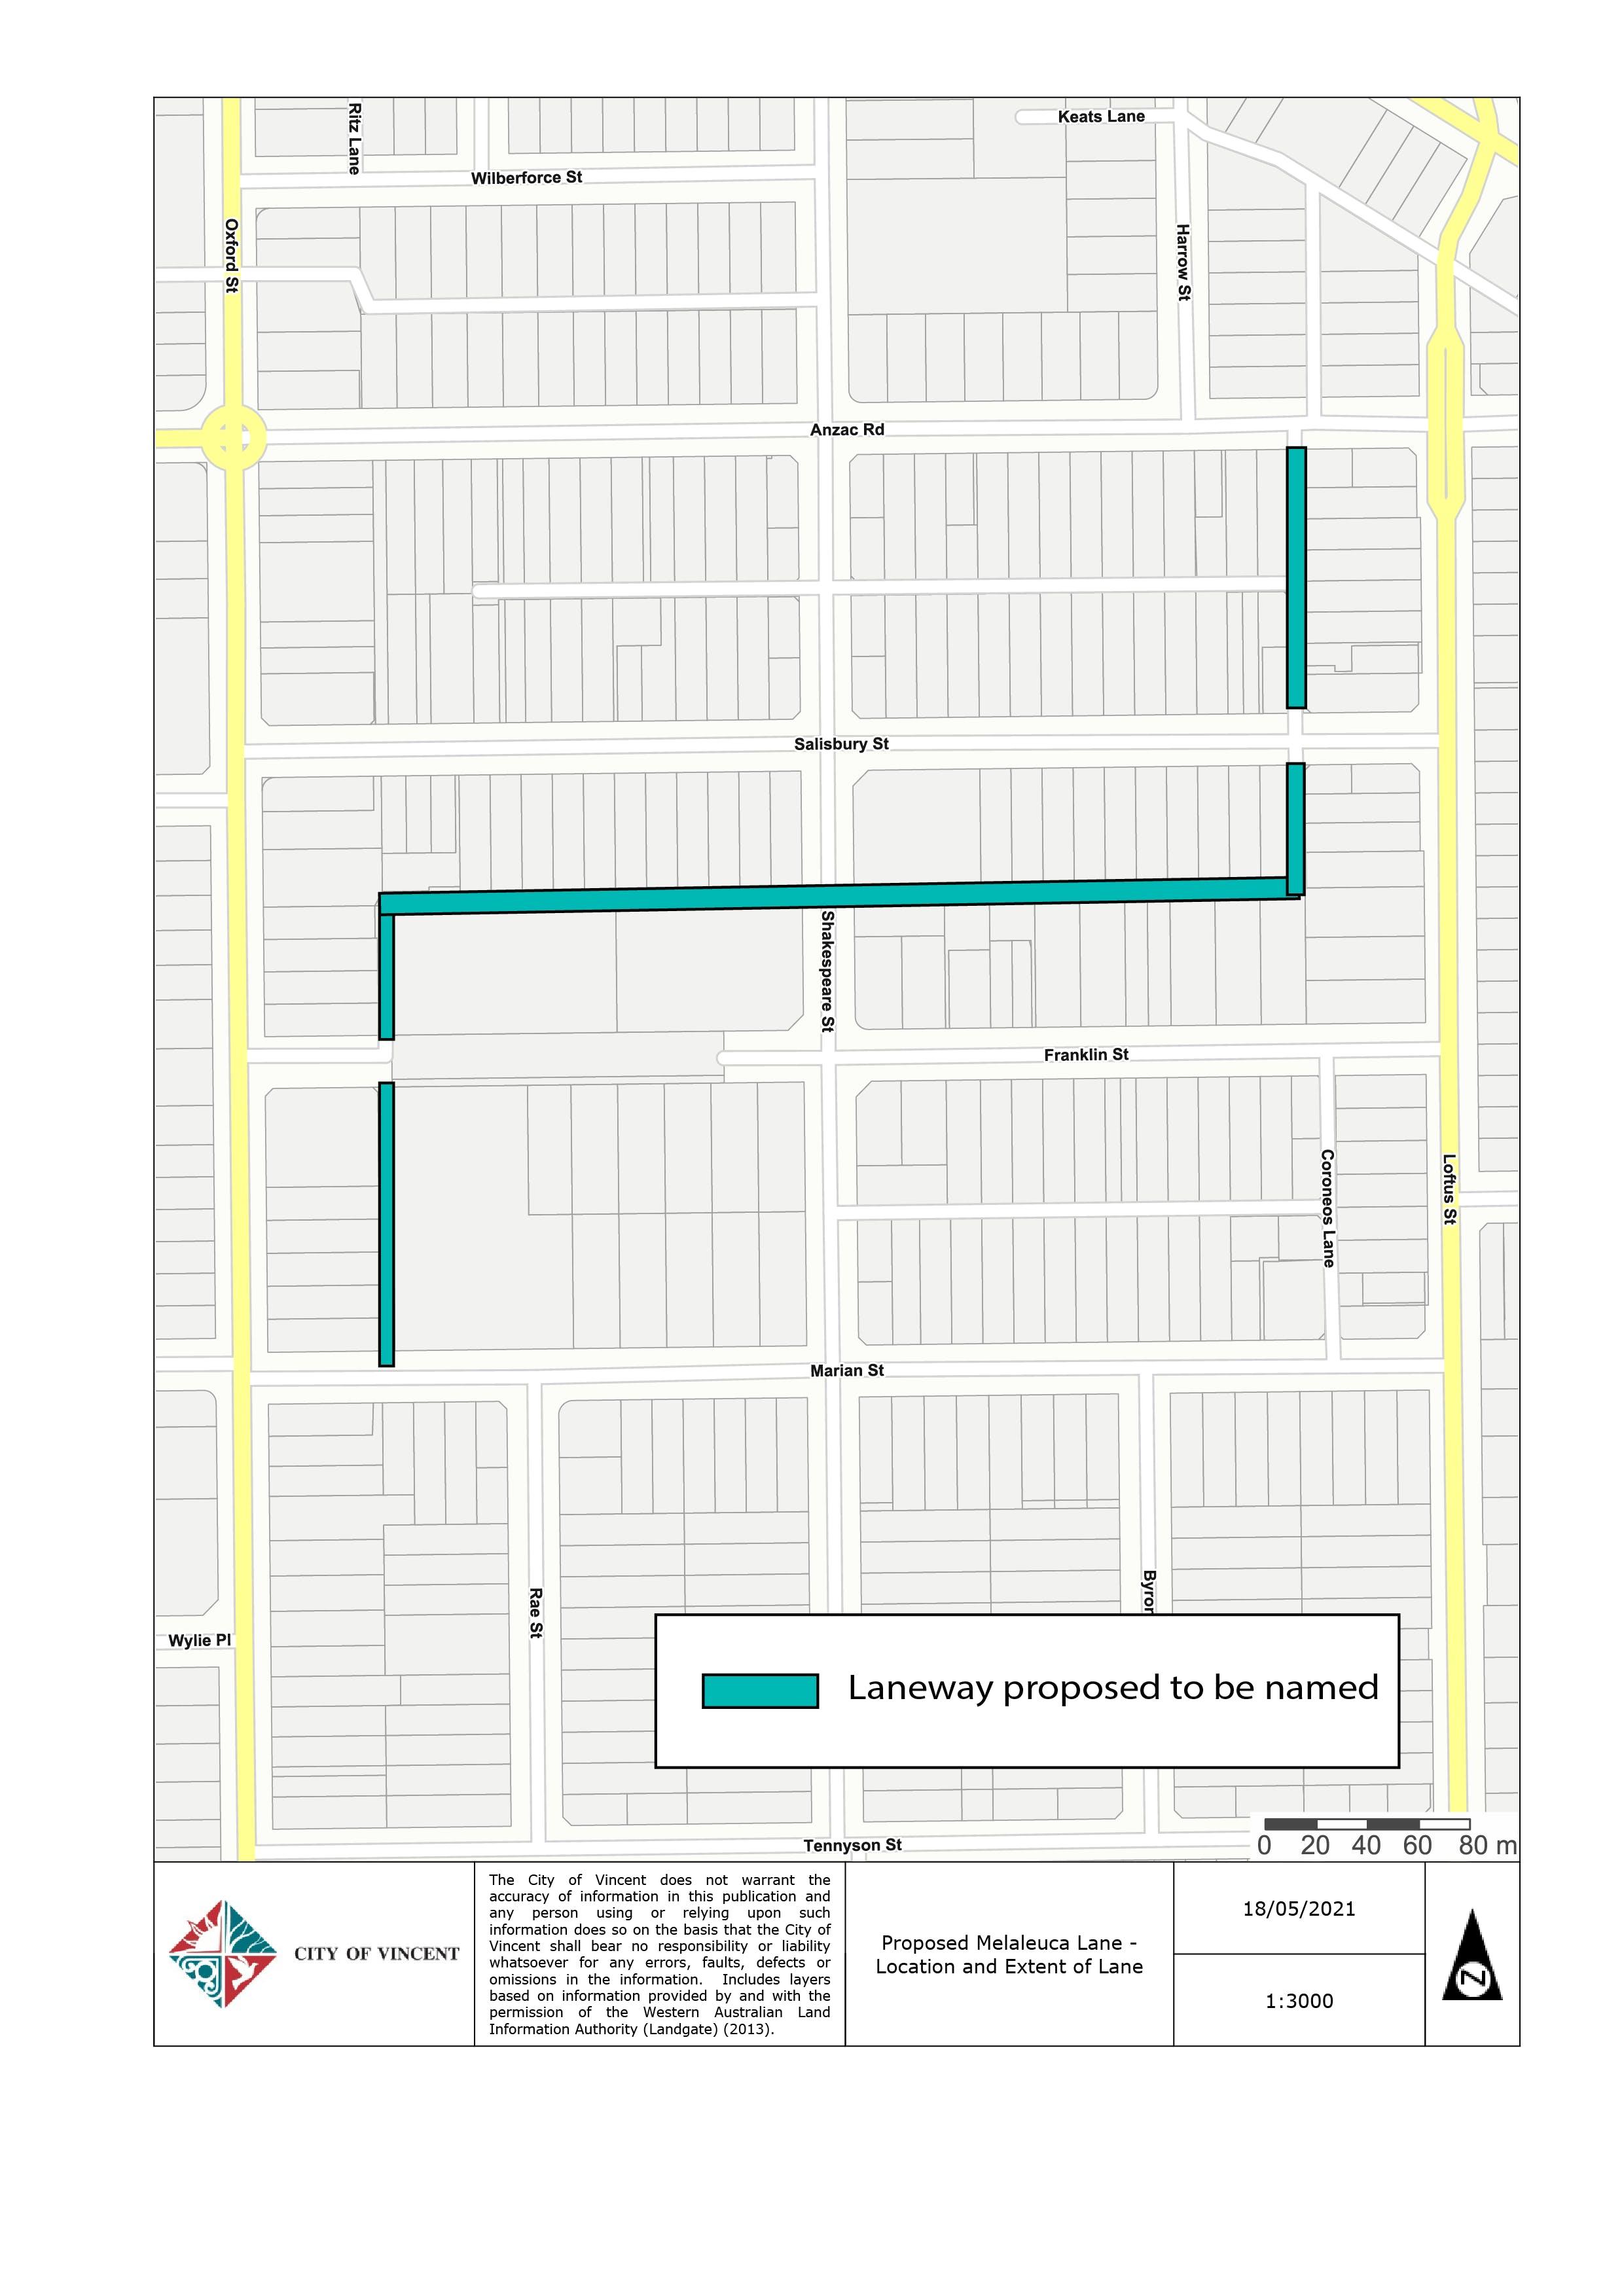 Melaleuca Lane - Location and Extent of Lane